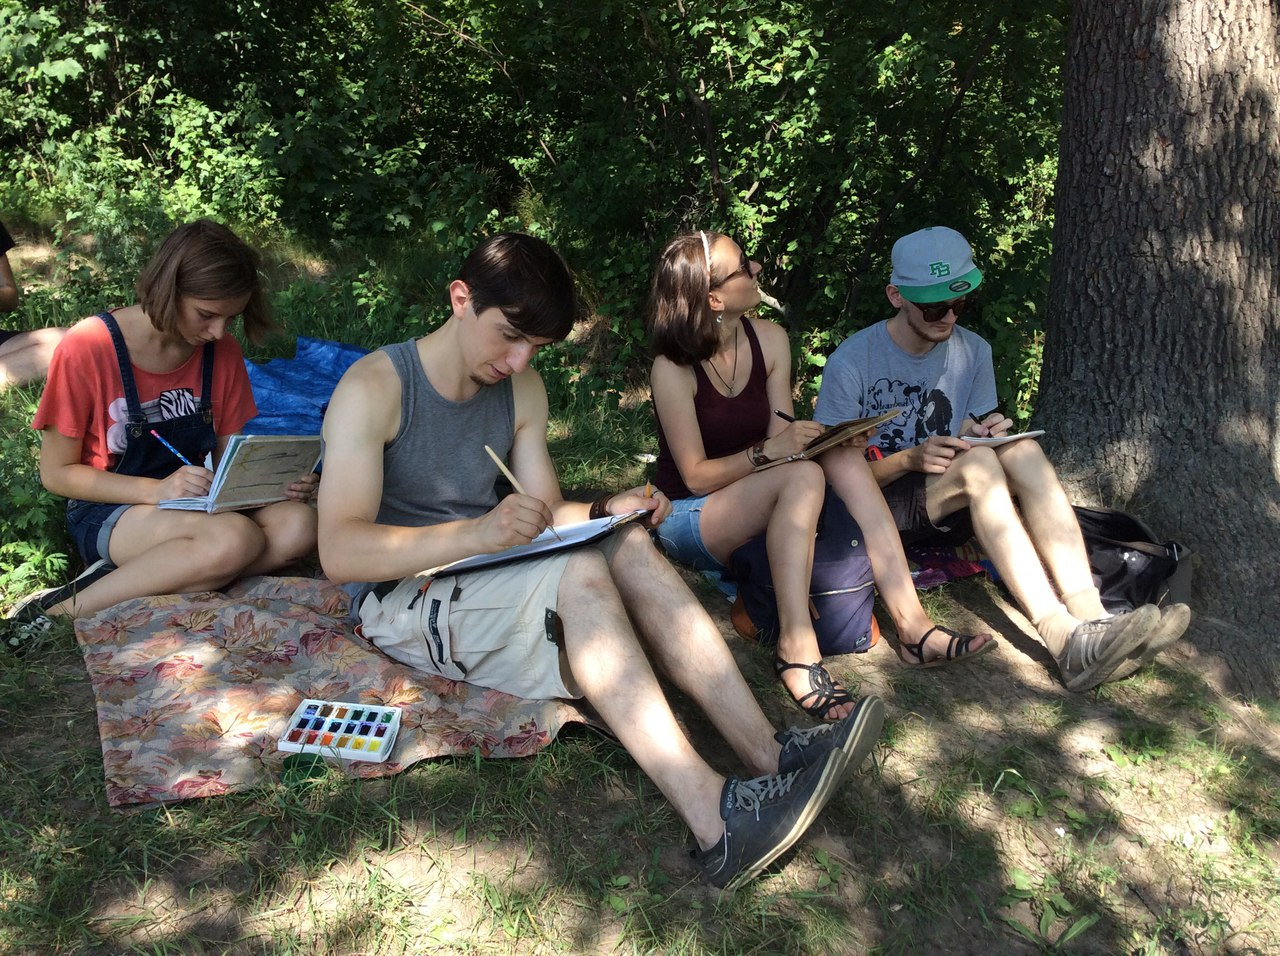 Летом часто проходят занятия кружка на свежем воздухе